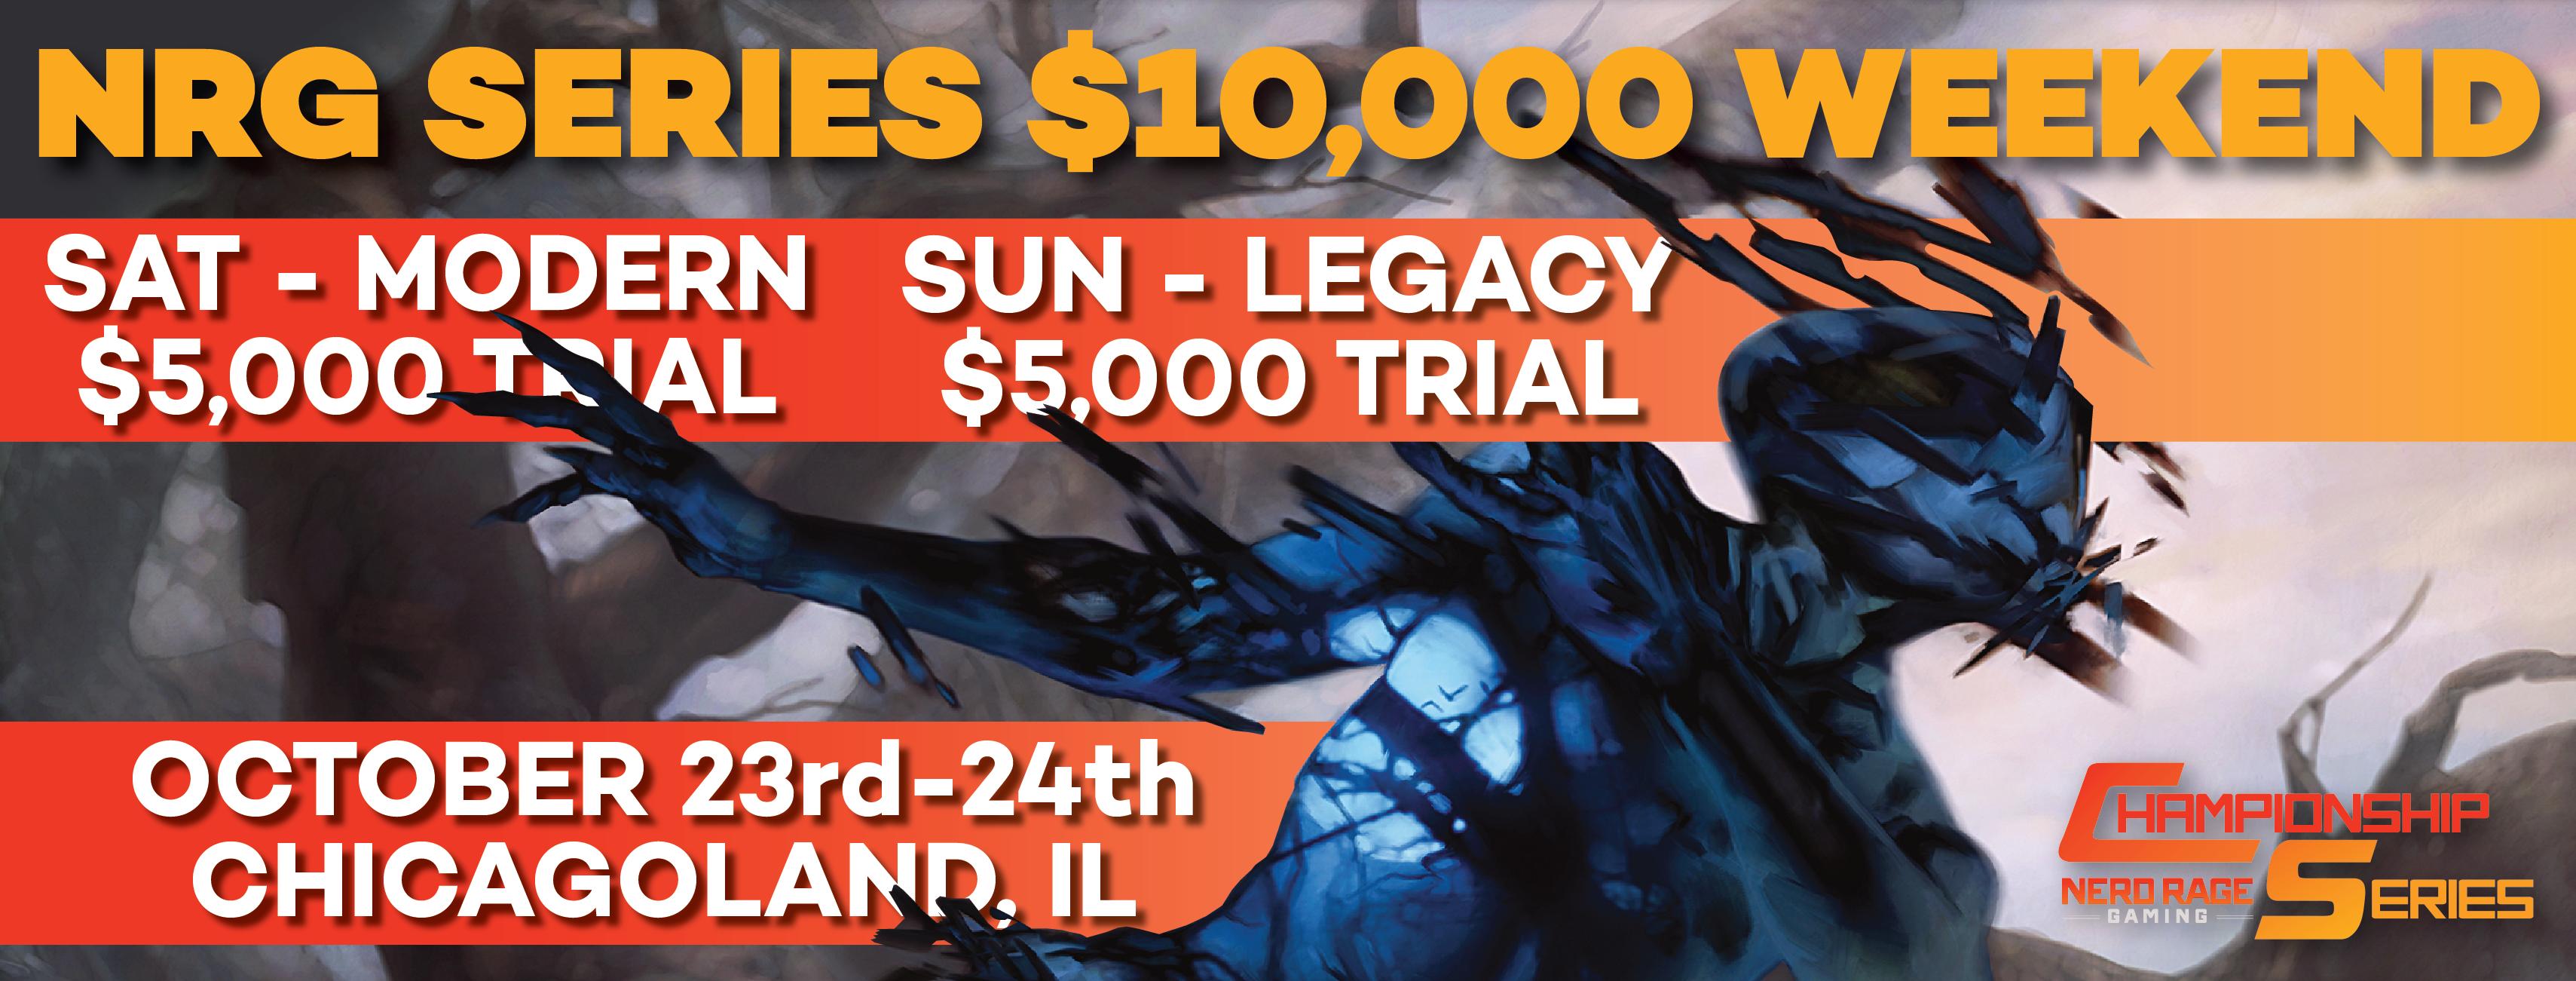 NRG Series Chicago Trial Weekend - October 2021